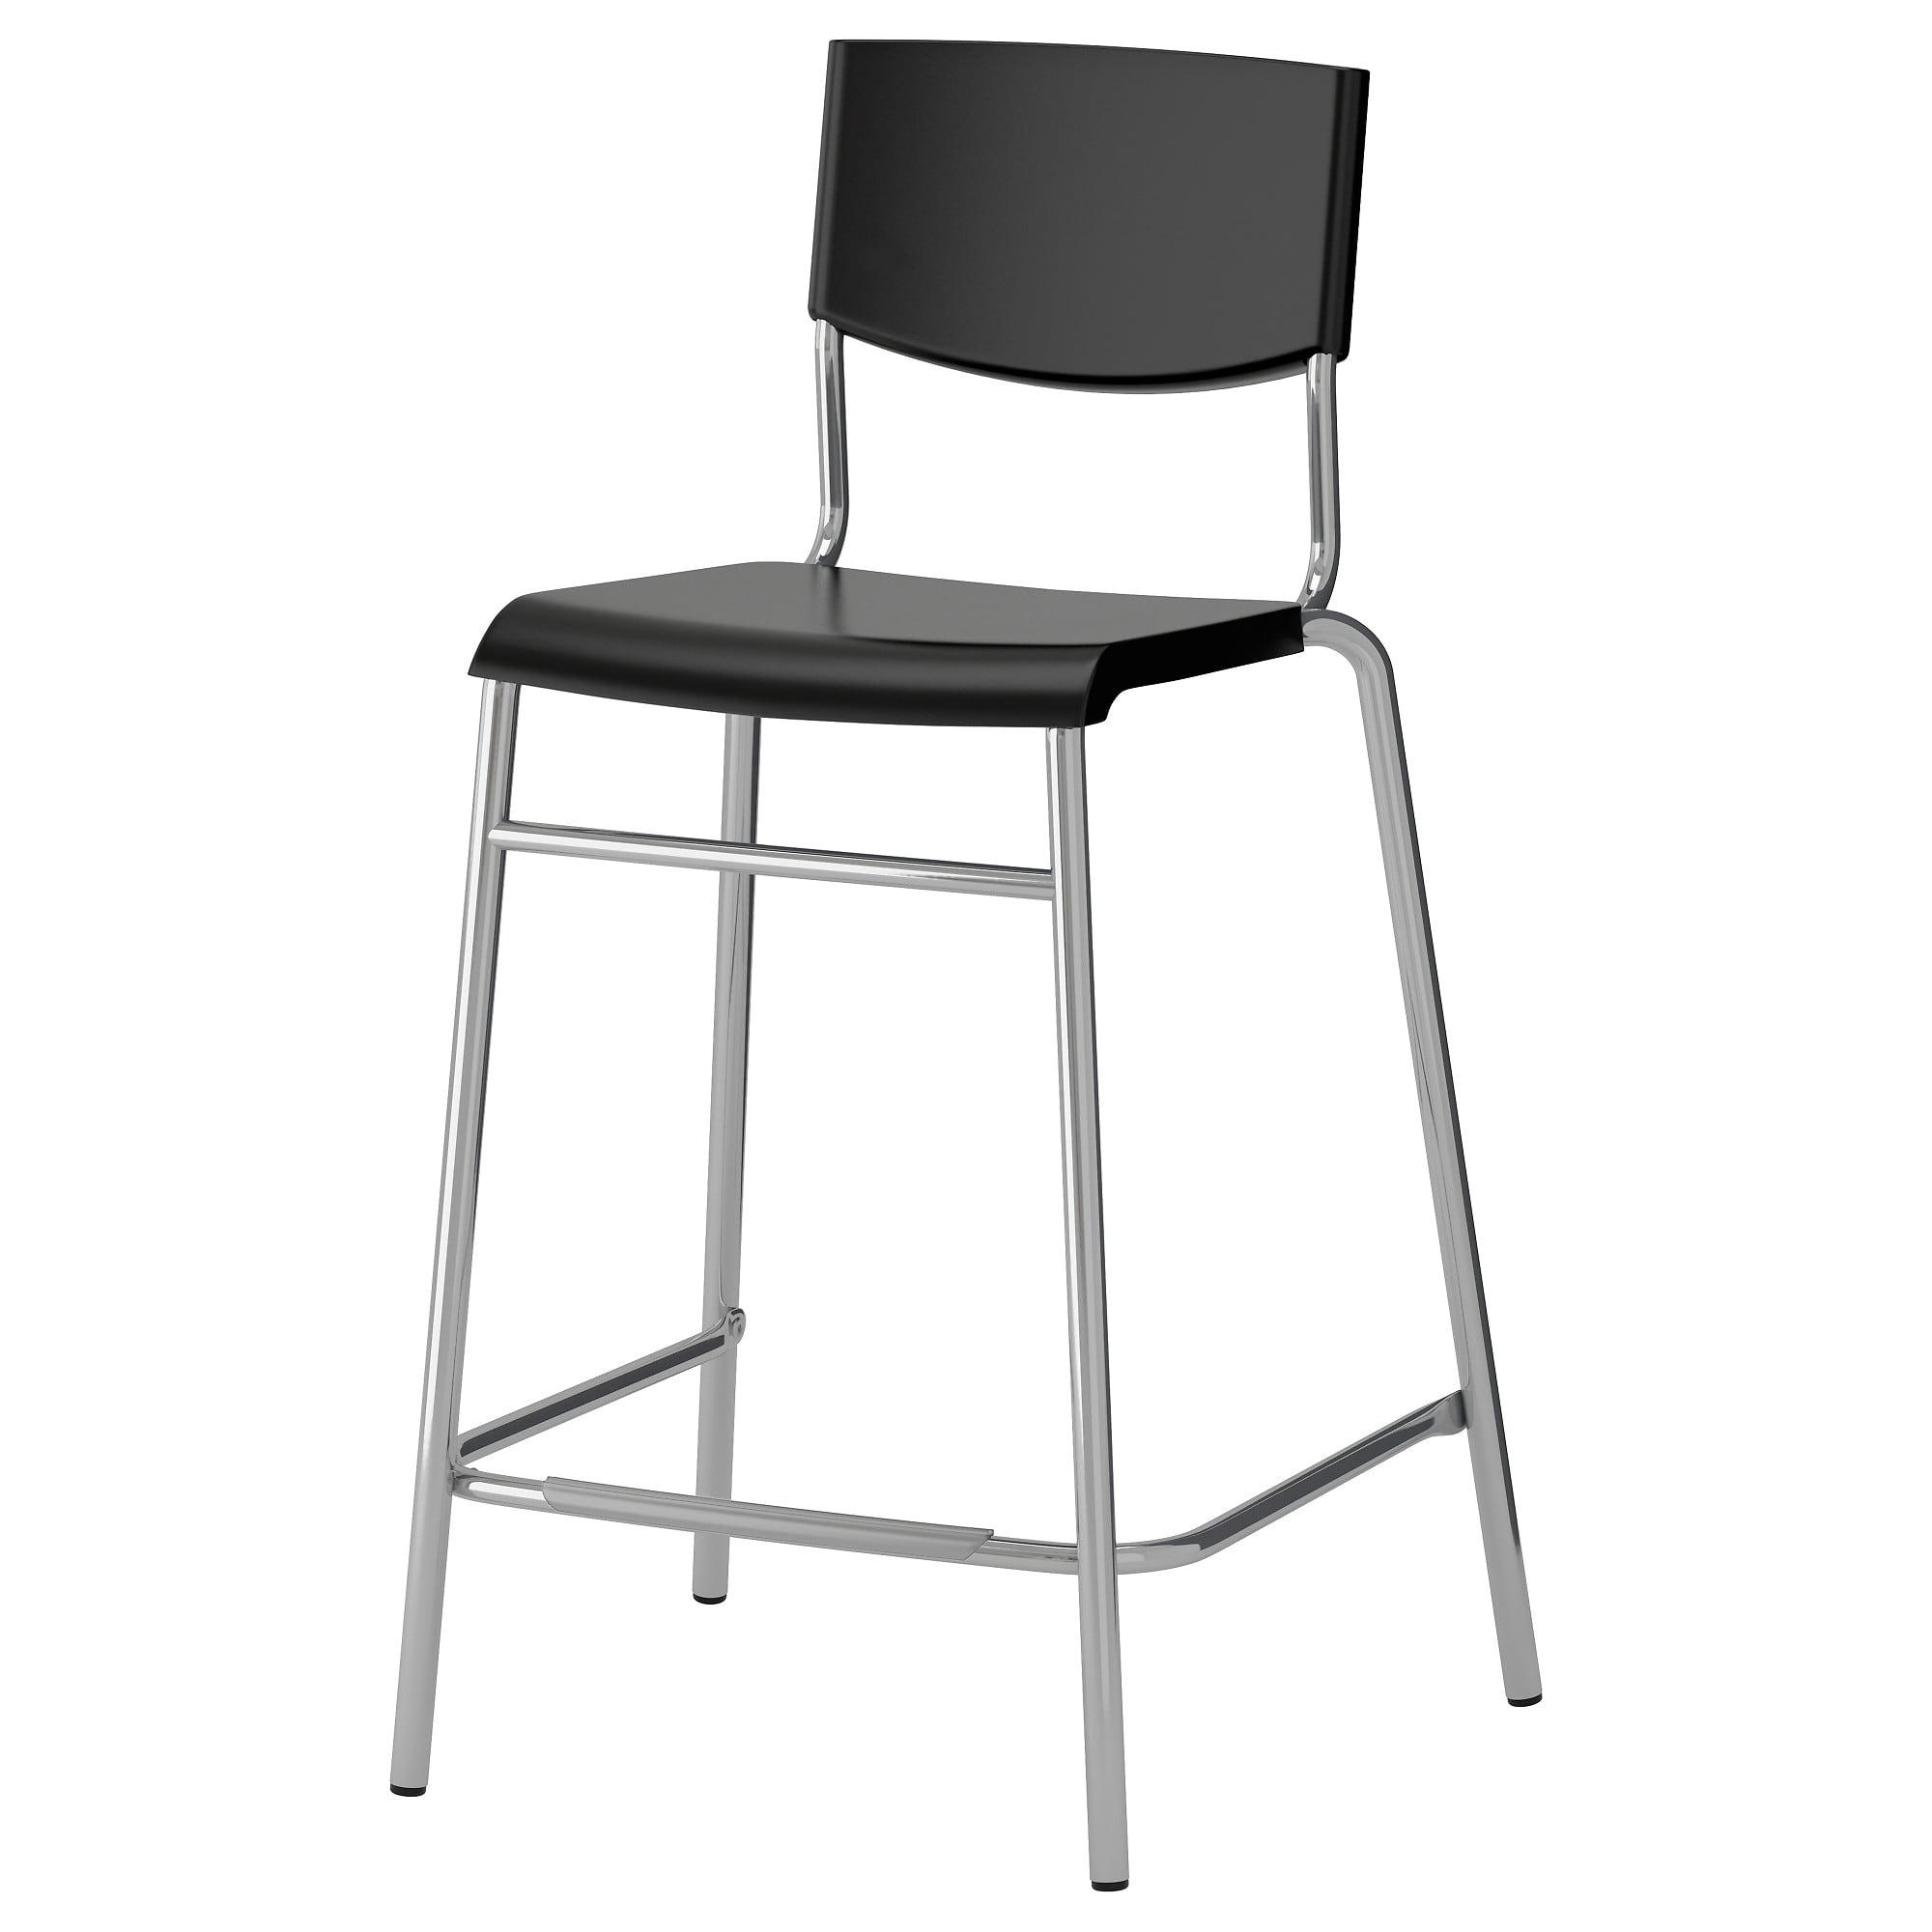 Ikea Stig Black Silver Color Bar Stool With Backrest Ikea